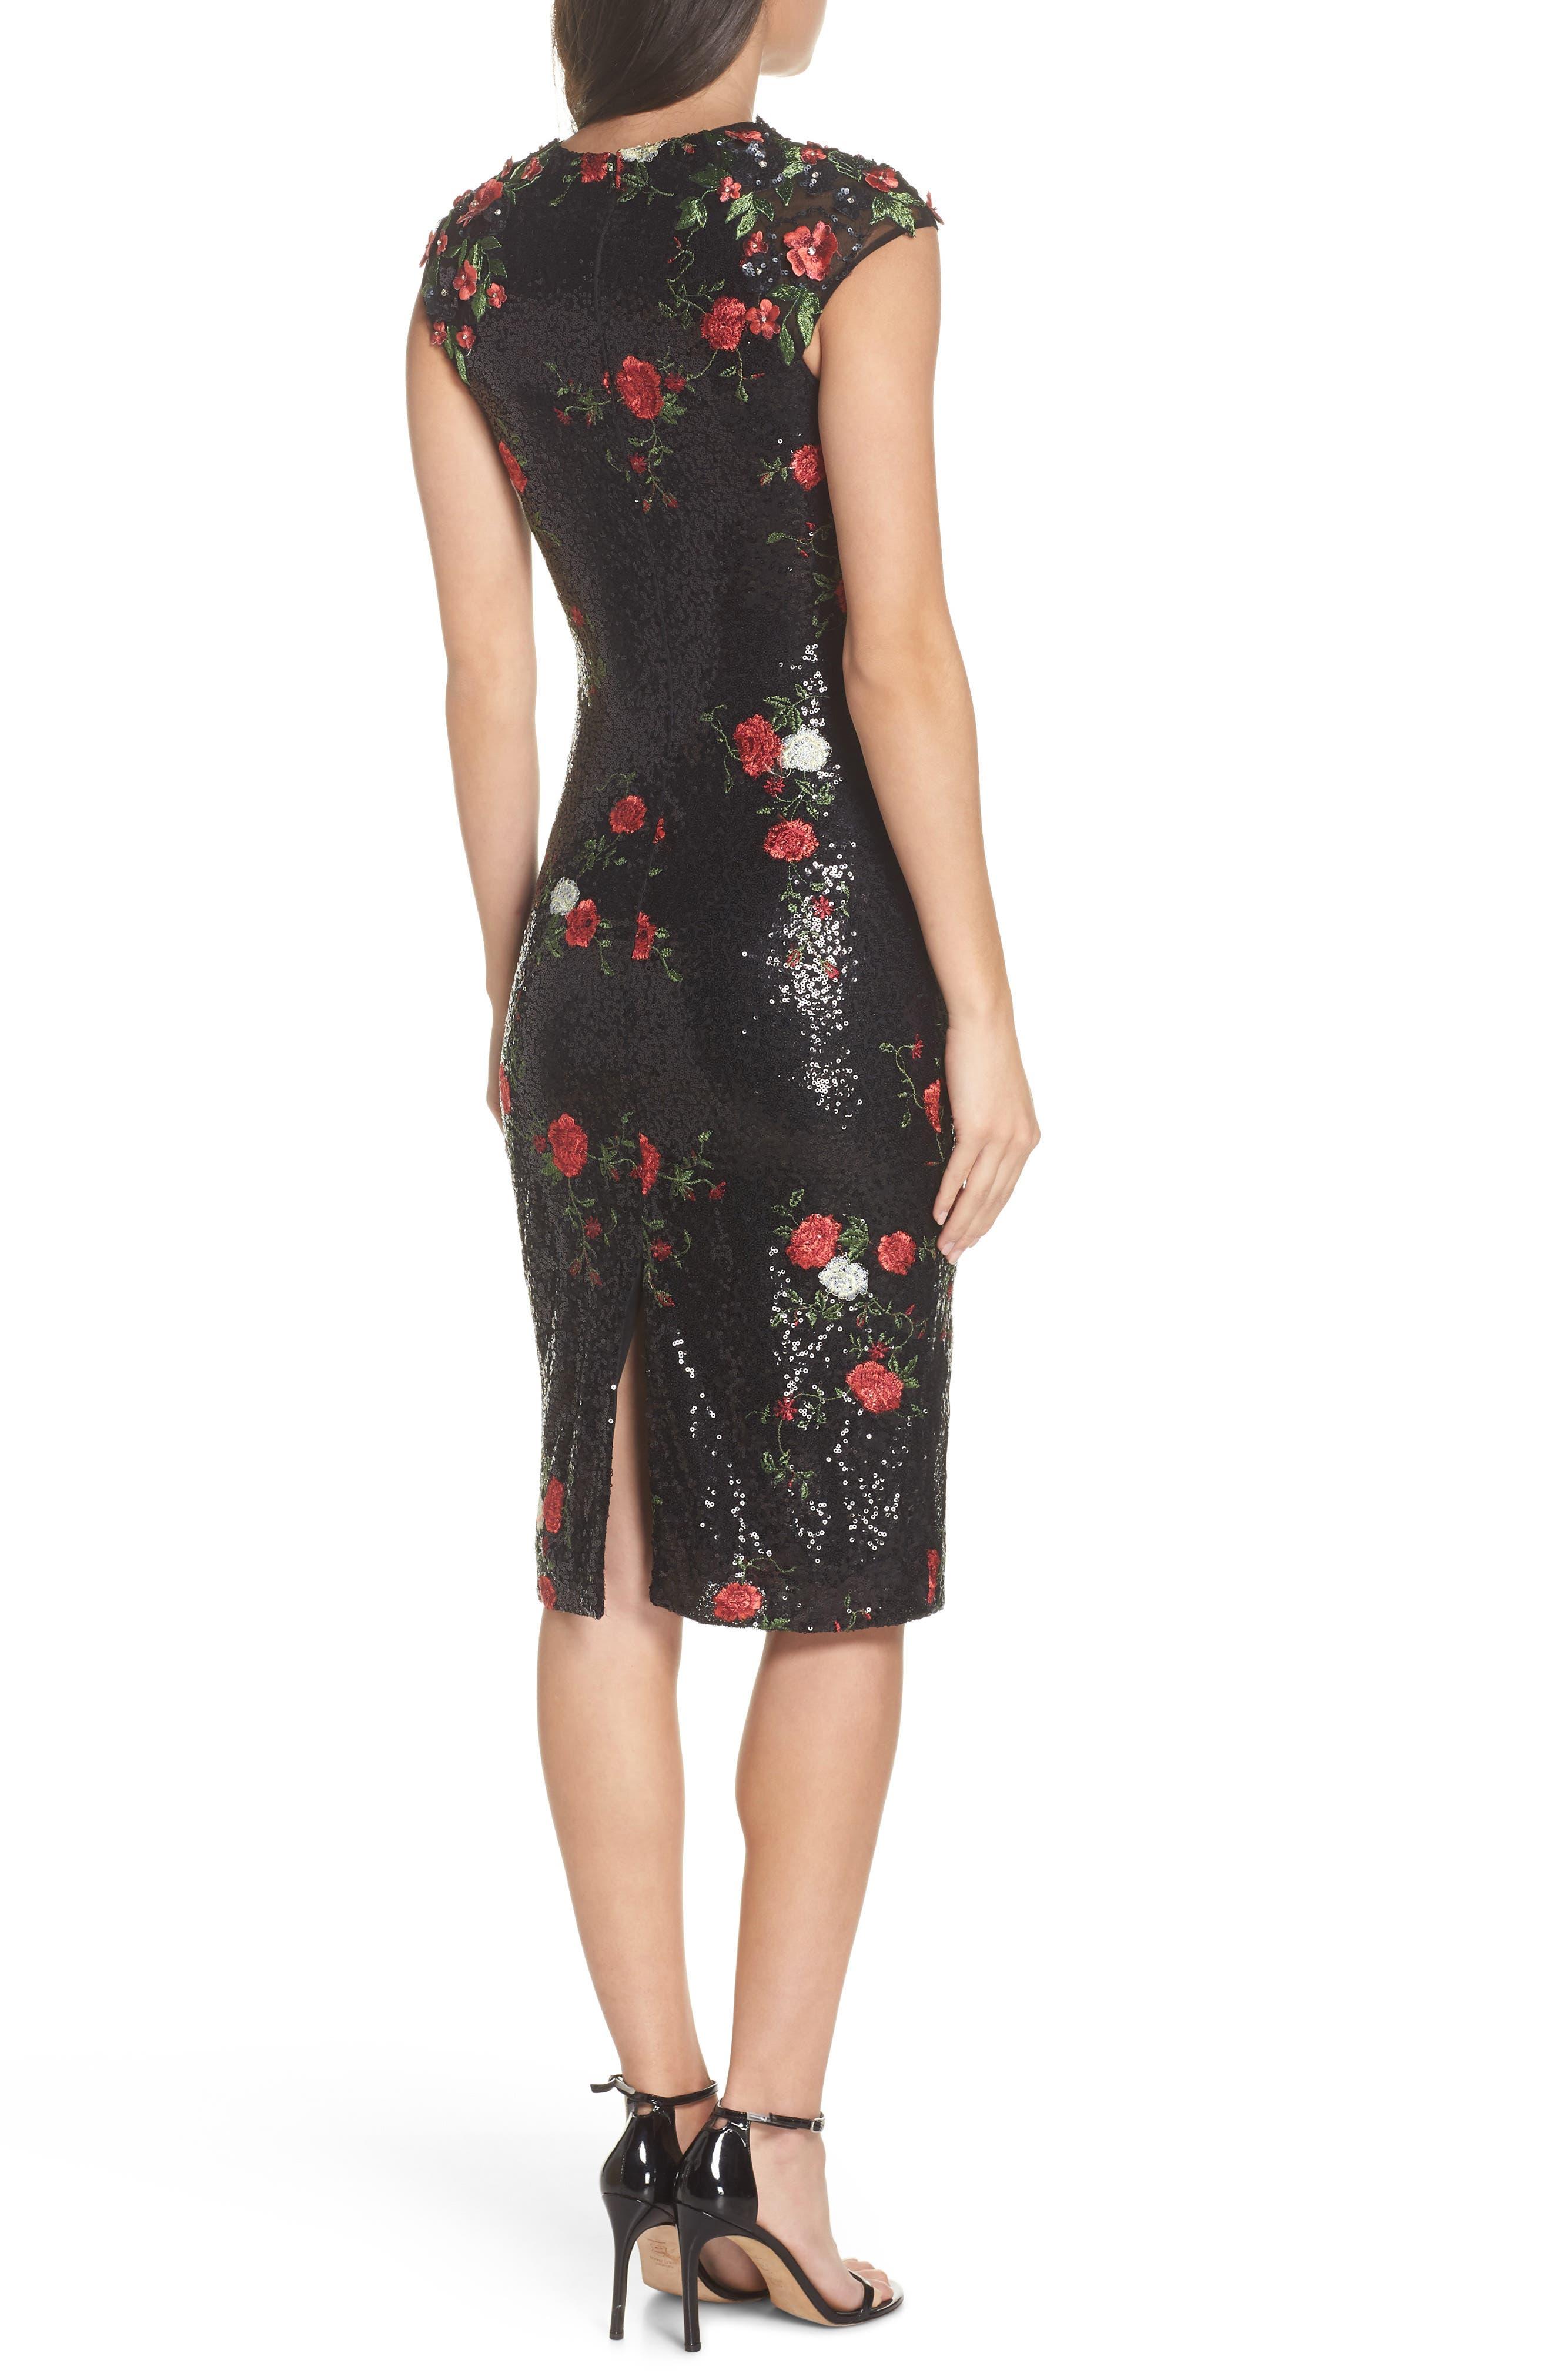 MAC DUGGAL, Sequin & Embroidery Sheath Dress, Alternate thumbnail 2, color, BLACK ROSE